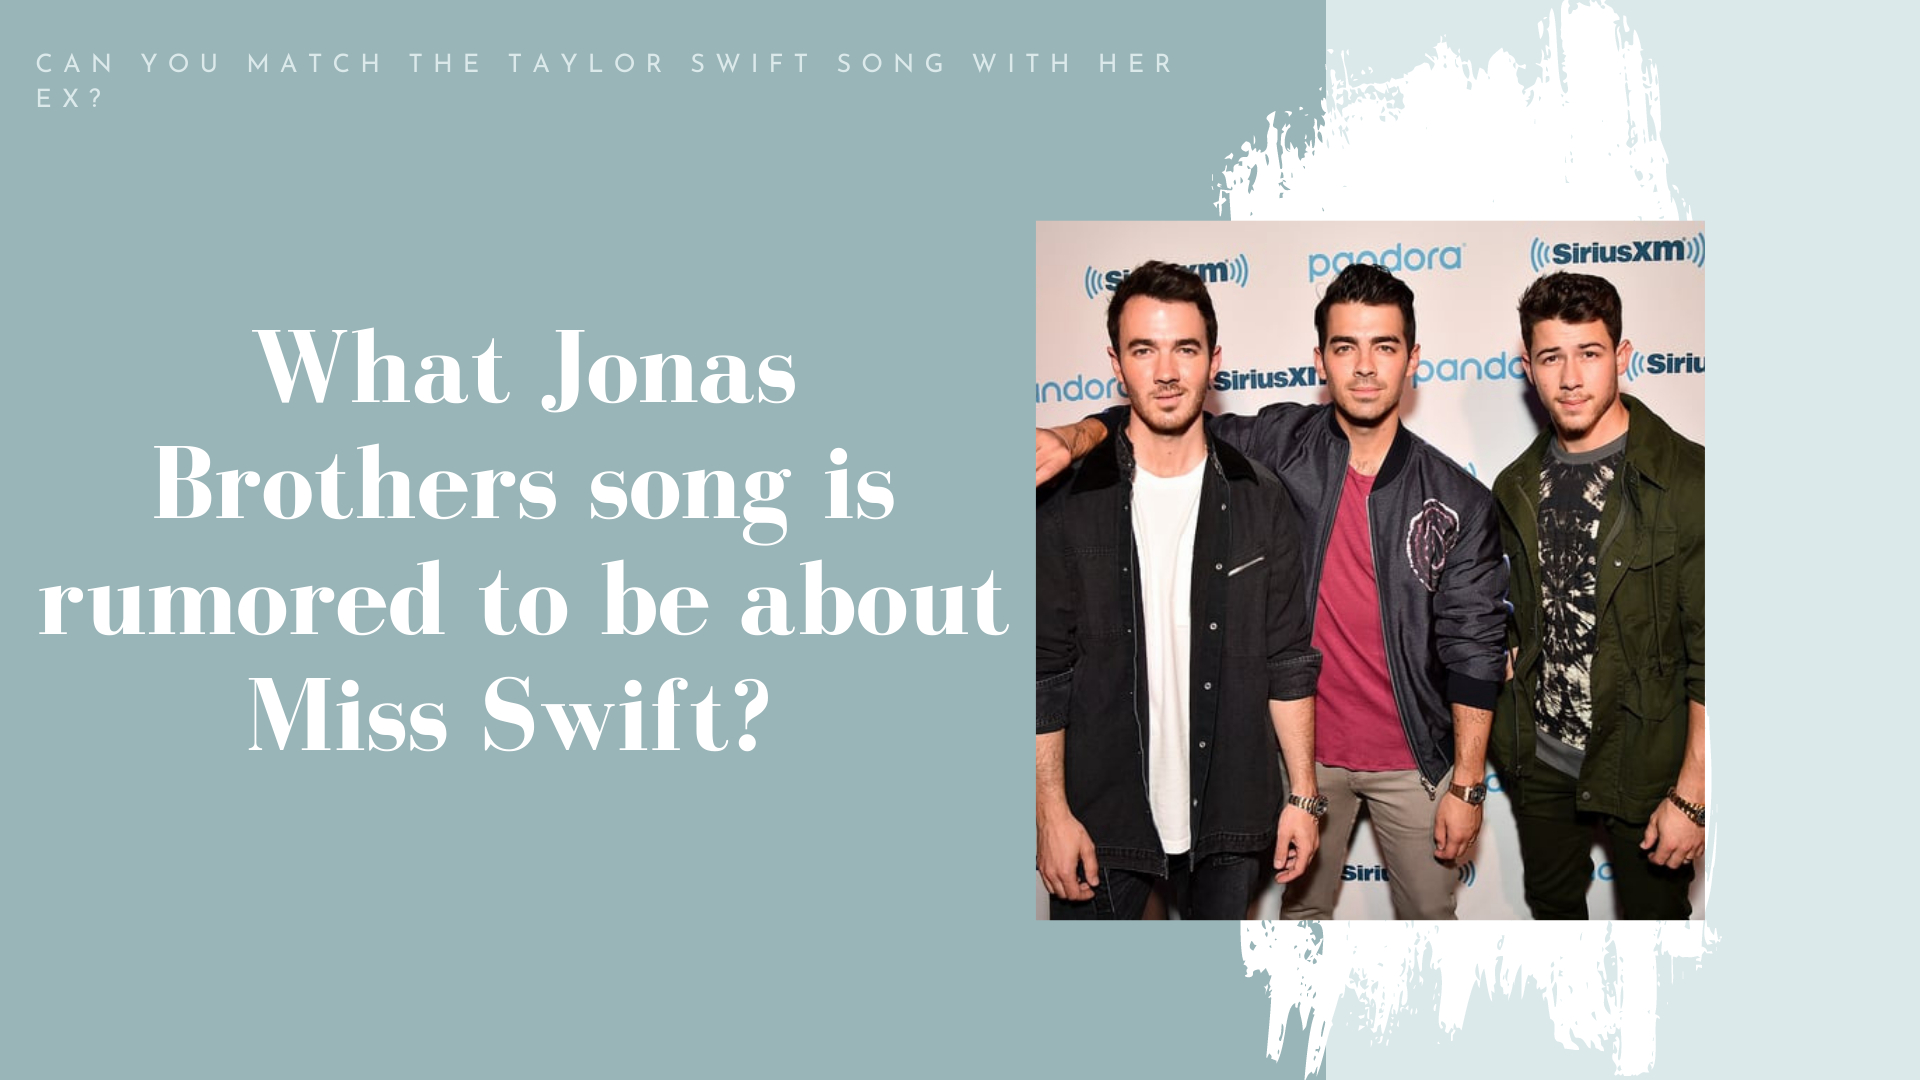 jonas brothers song